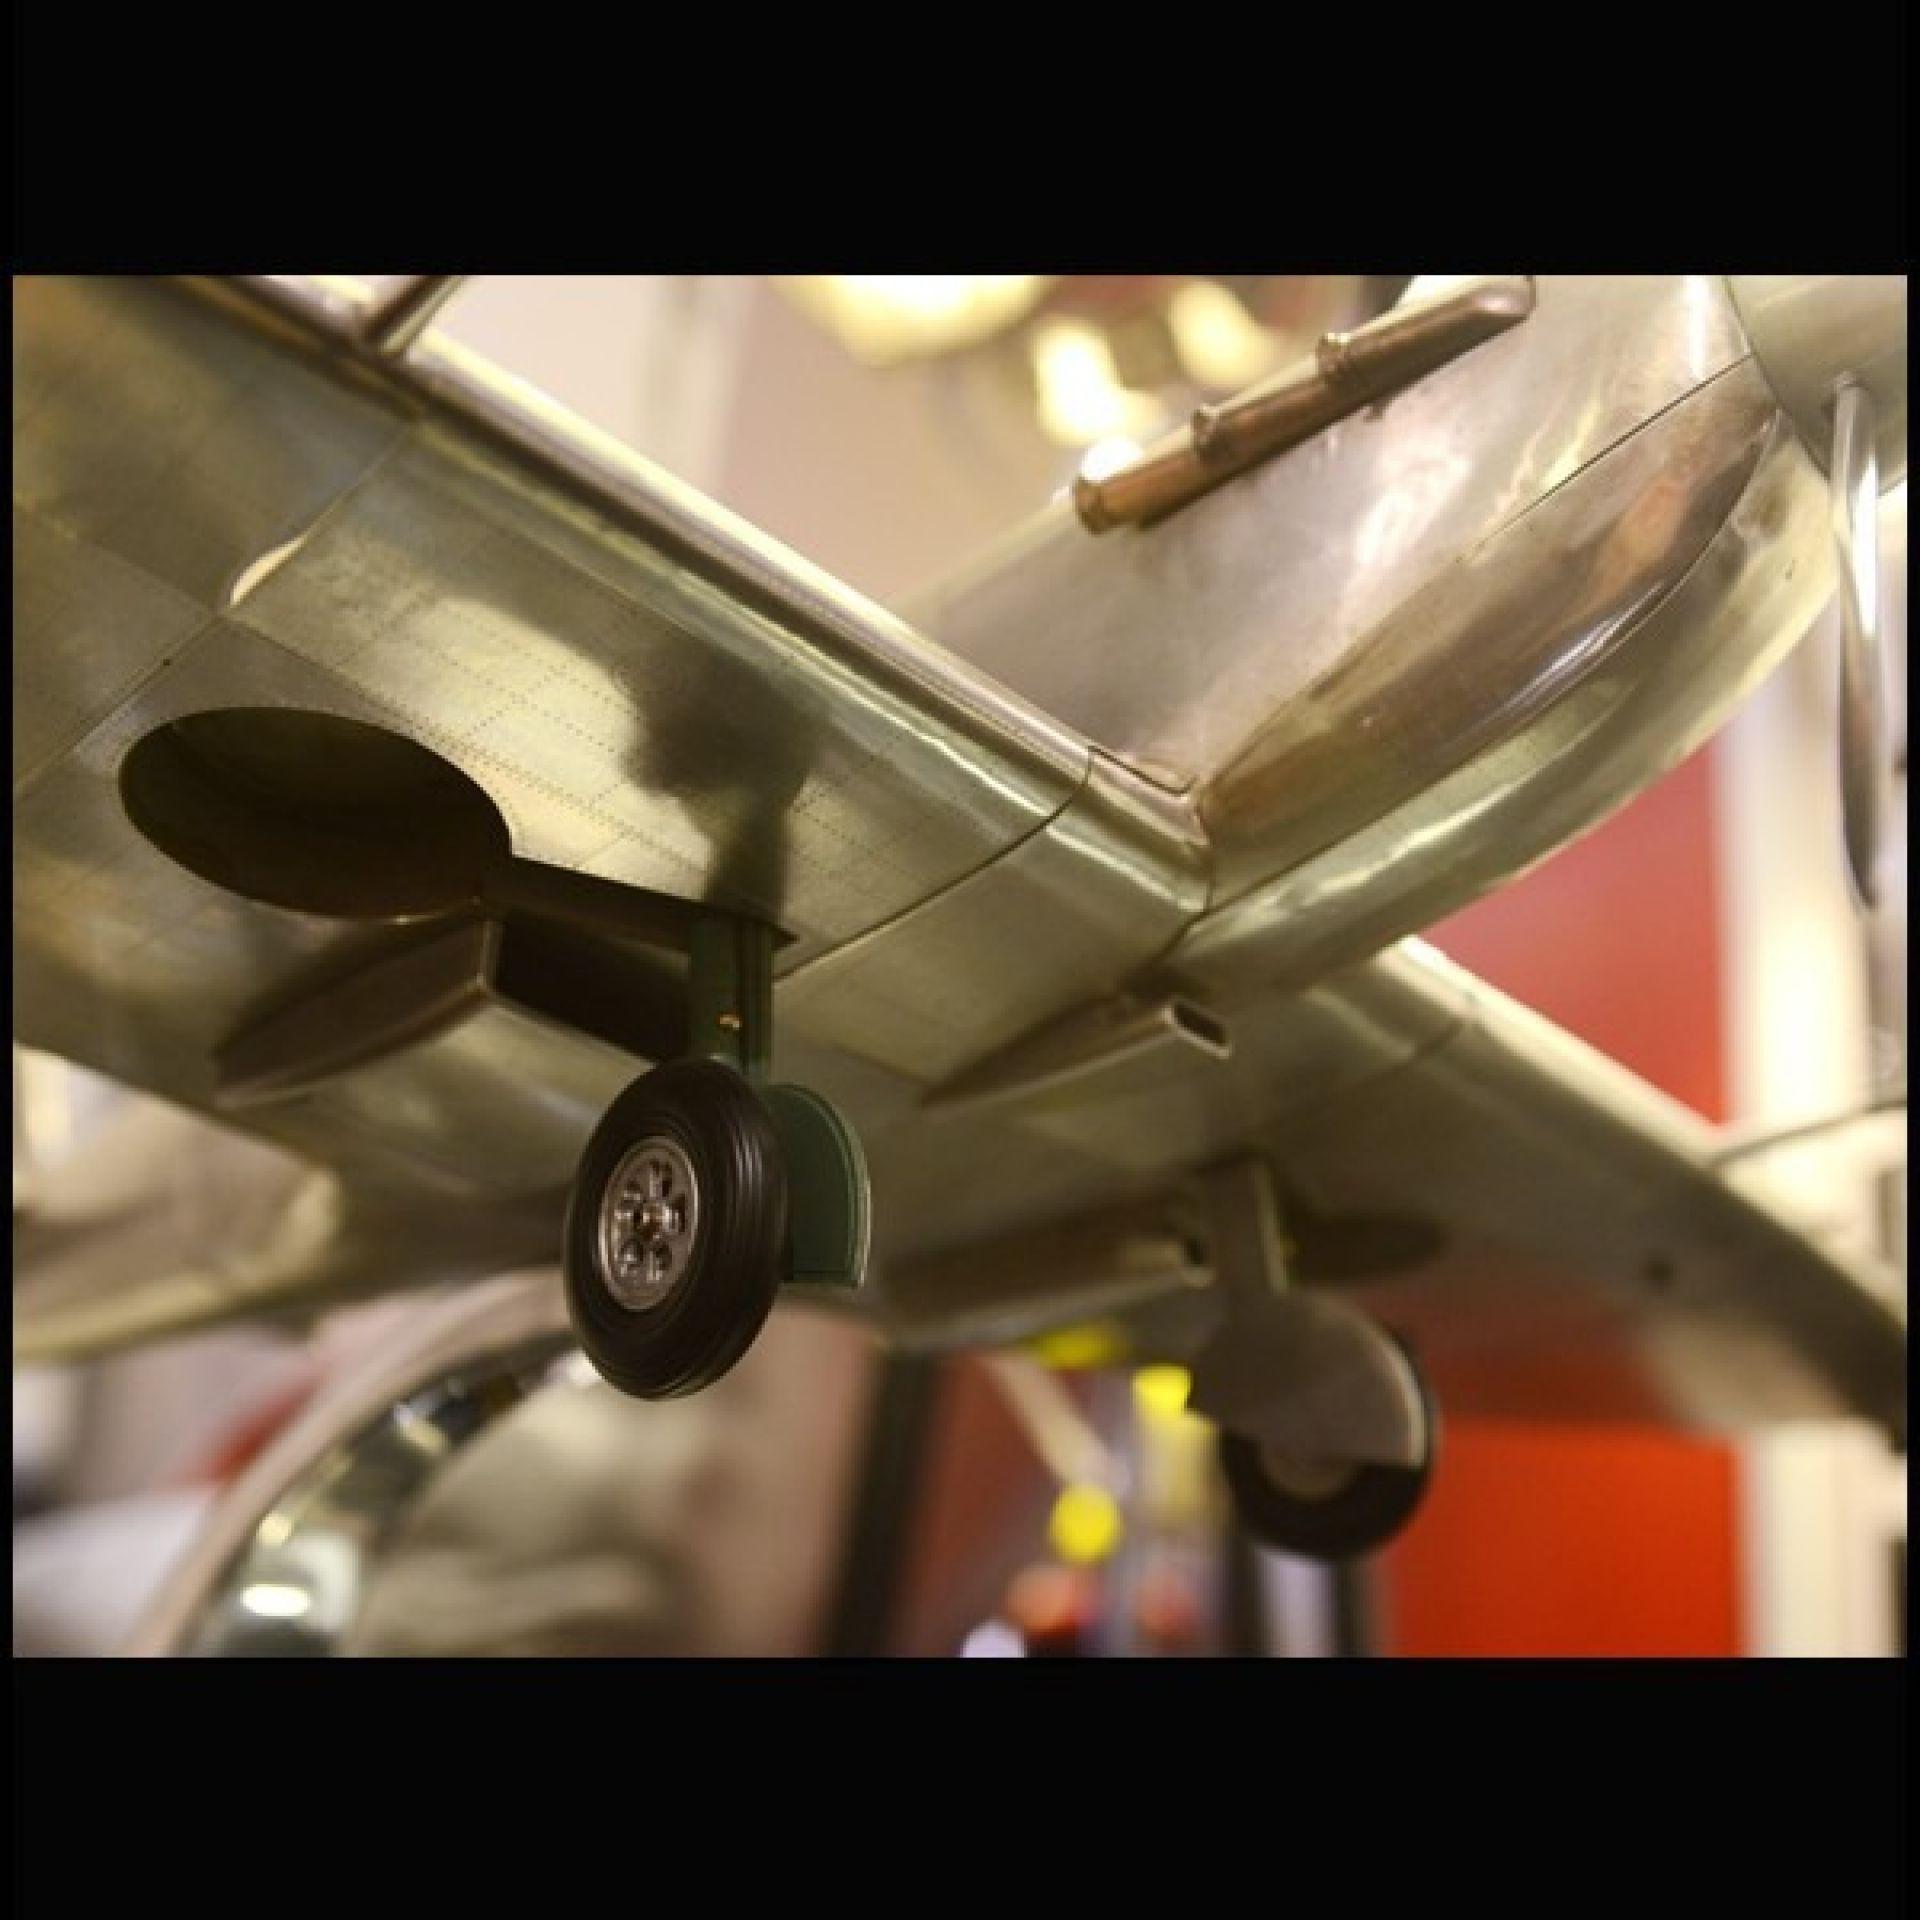 SPITFIRE MODEL AIRCRAFT MODEL HANDCRAFTED 133-SPITFIRE ALUMINUM FOIL